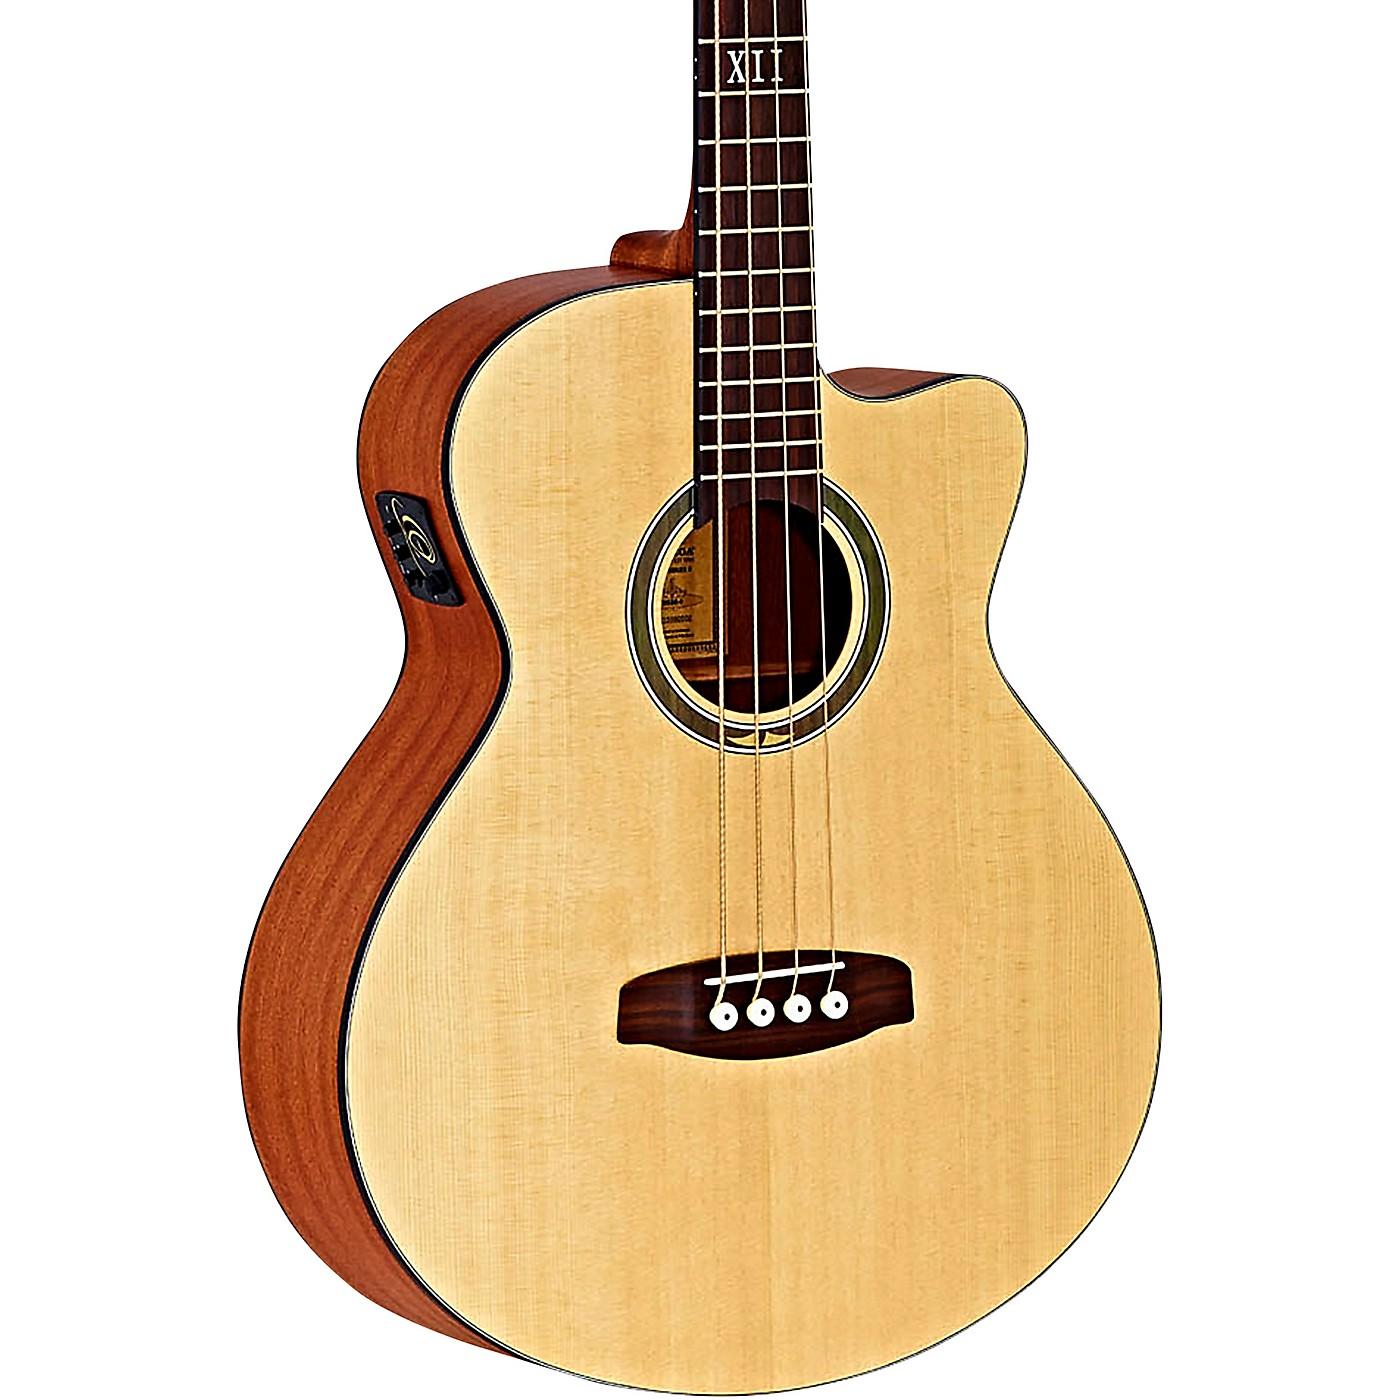 Ortega Deep Series 5 D538-4 Mahogany Acoustic-Electric Bass thumbnail